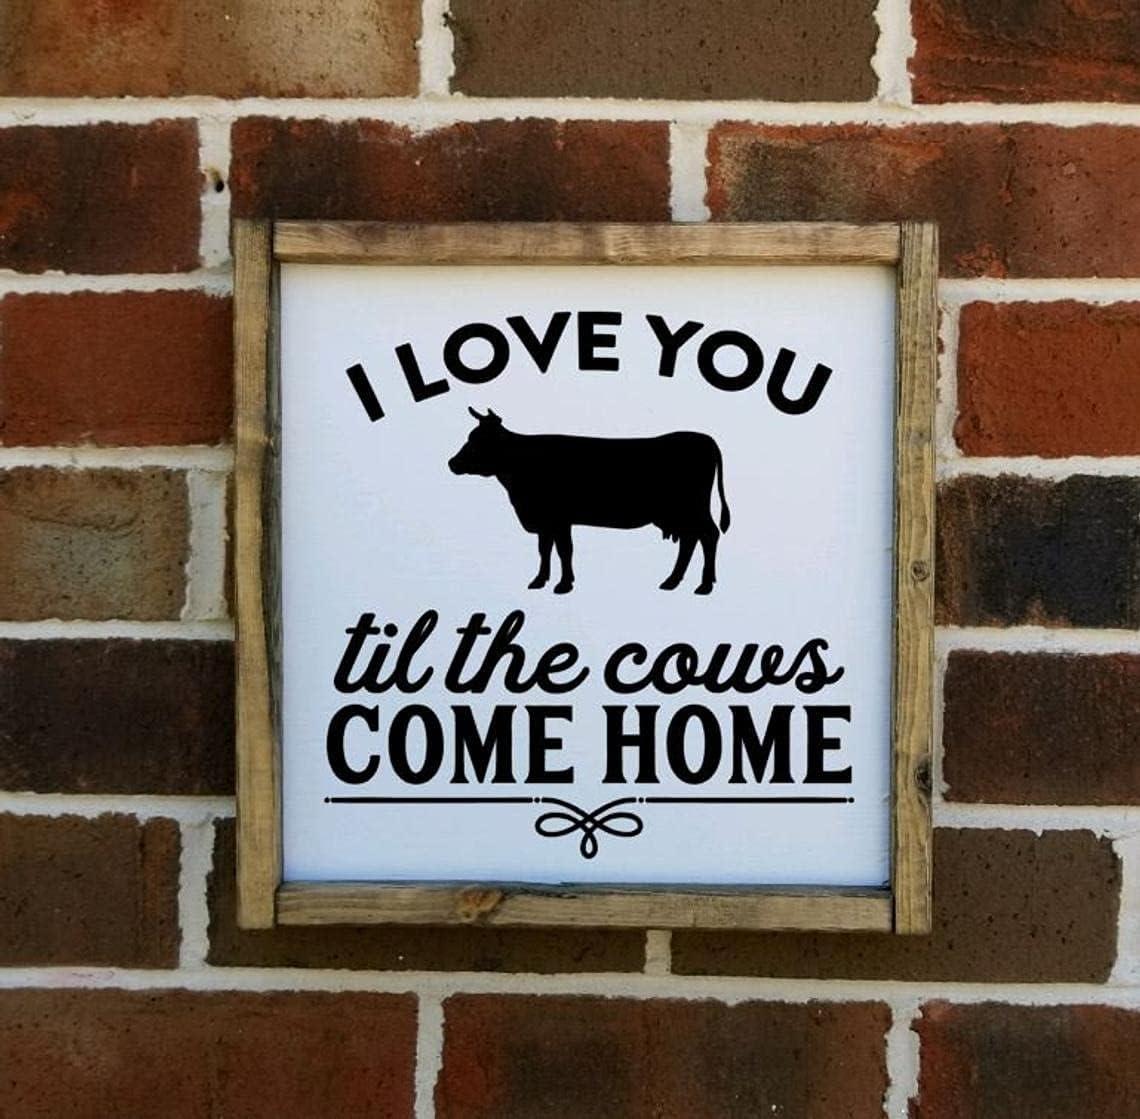 I Love You Till The Cows Come Home Farmhouse Style Framed Sign, Farmhouse Kitchen Decor, Multiple 7